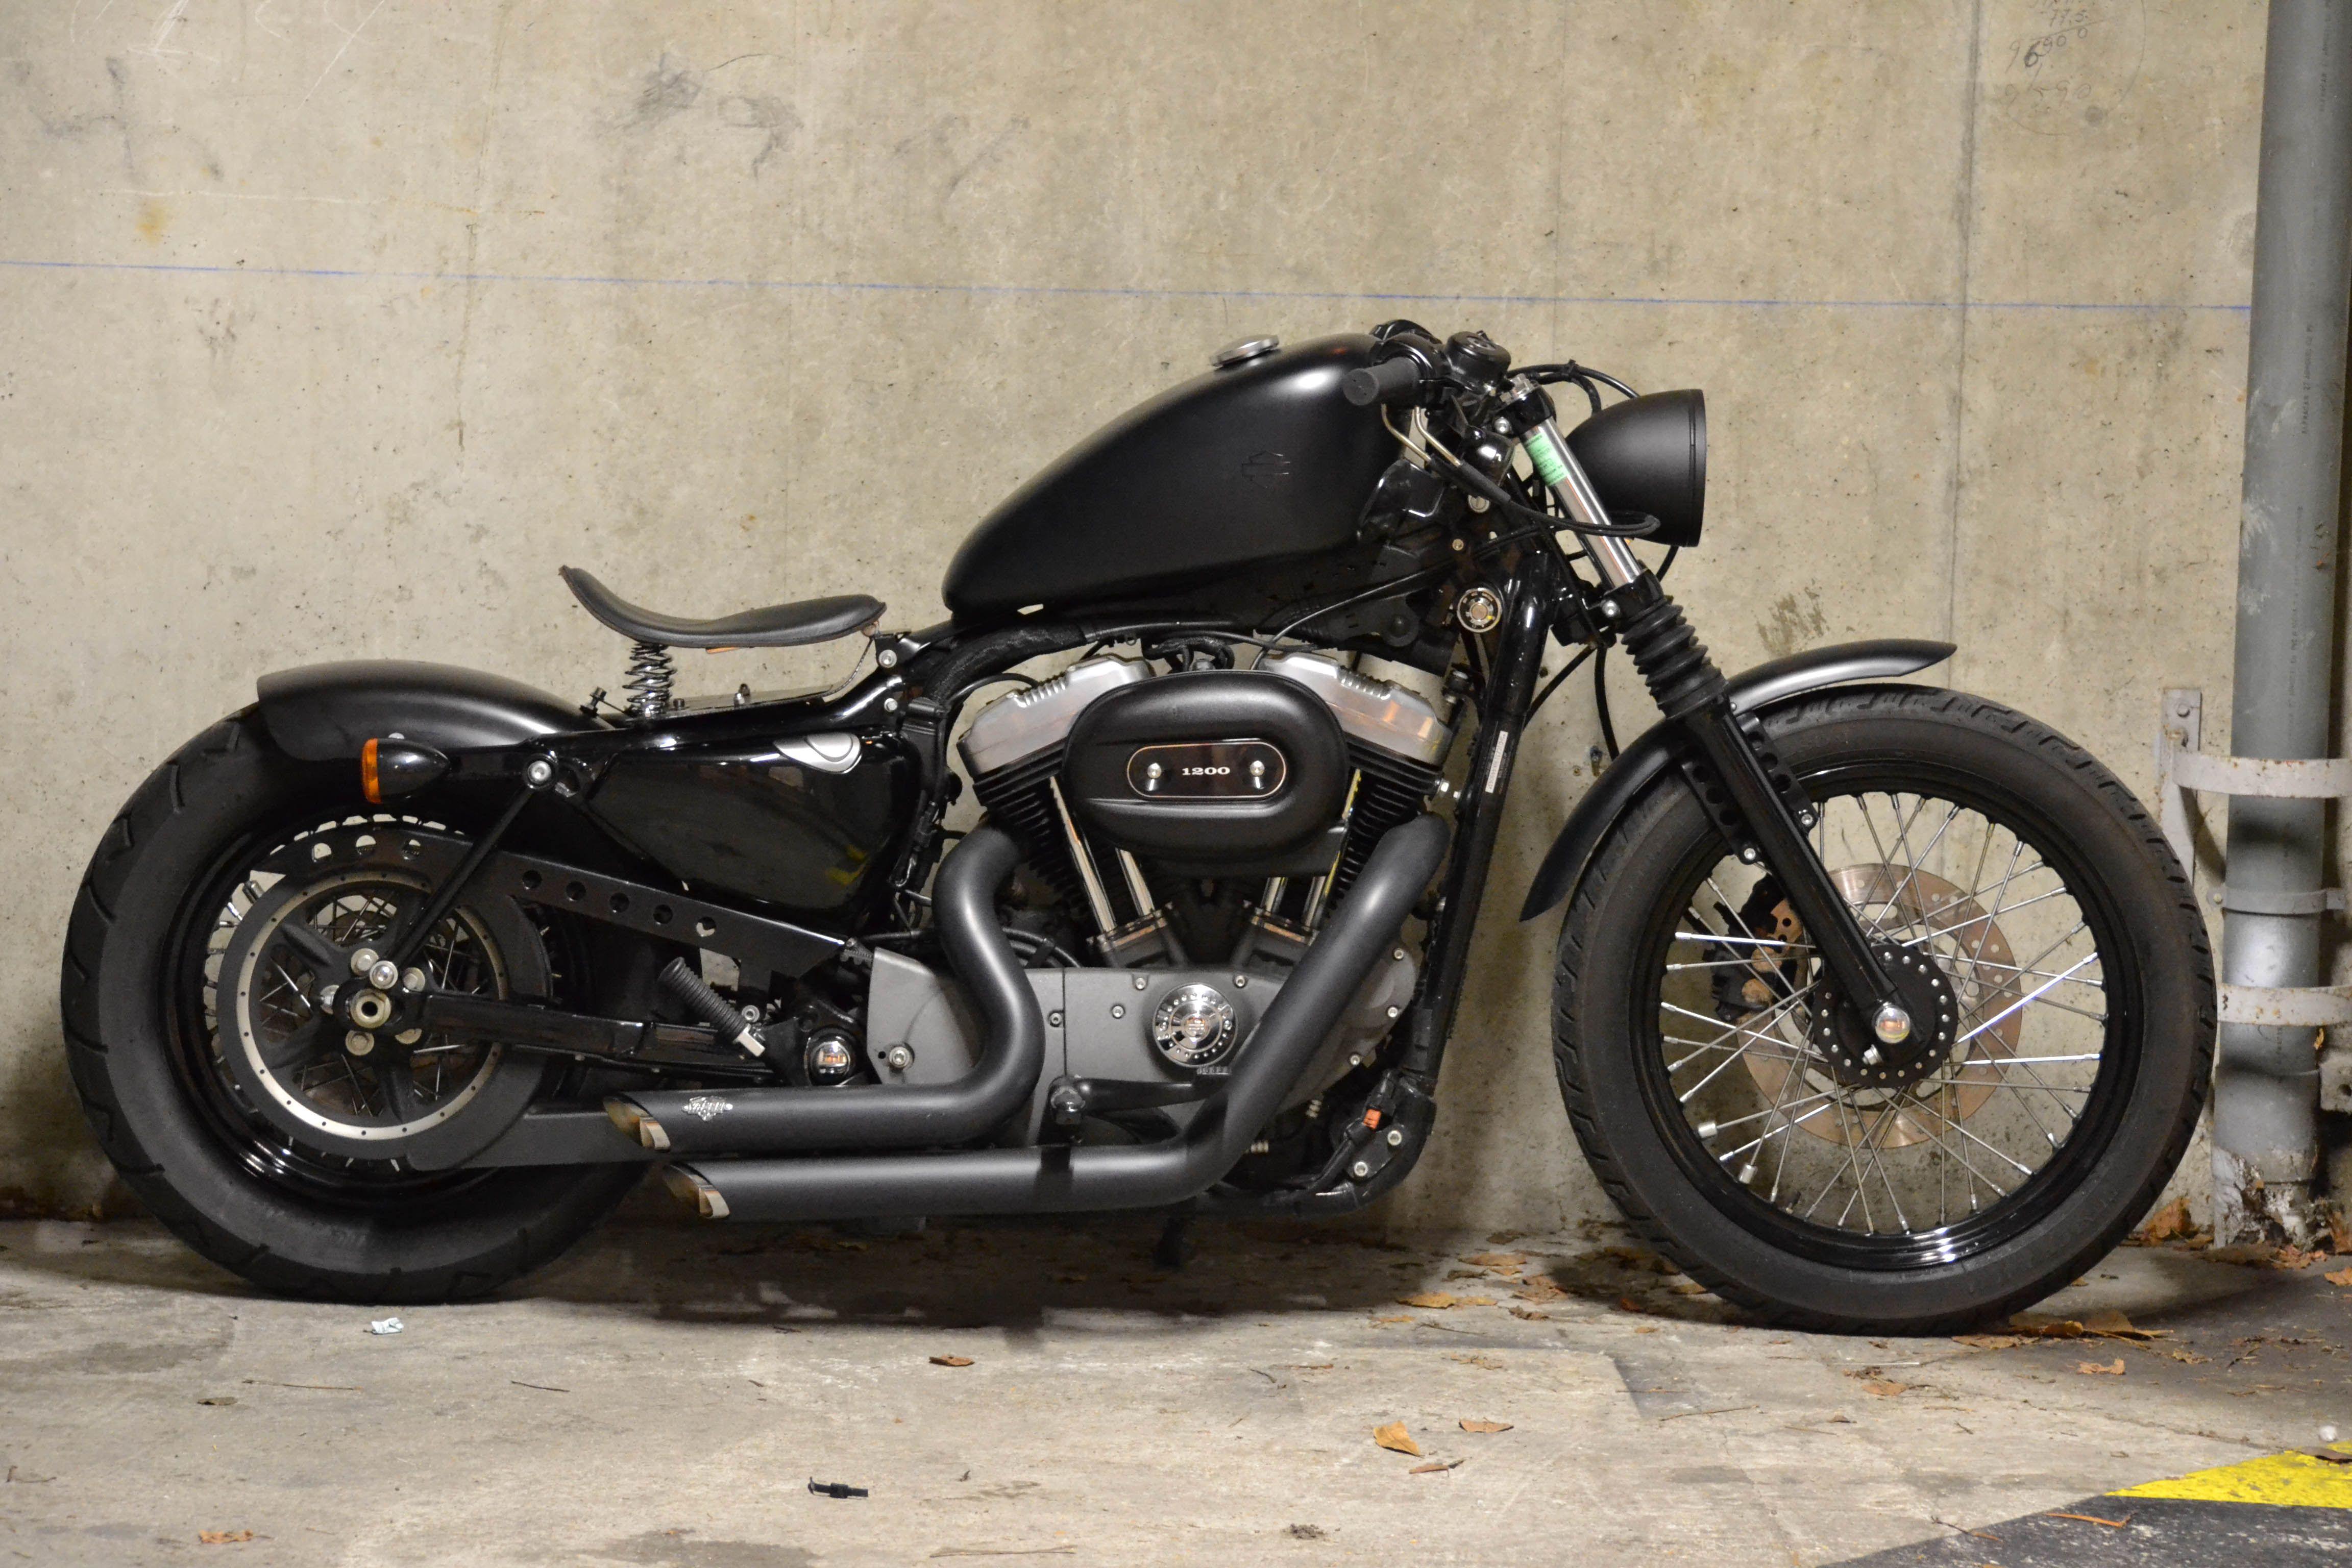 Harley Davidson Nightster | HOT RODS HOT WHEELS HOT LADIES ...